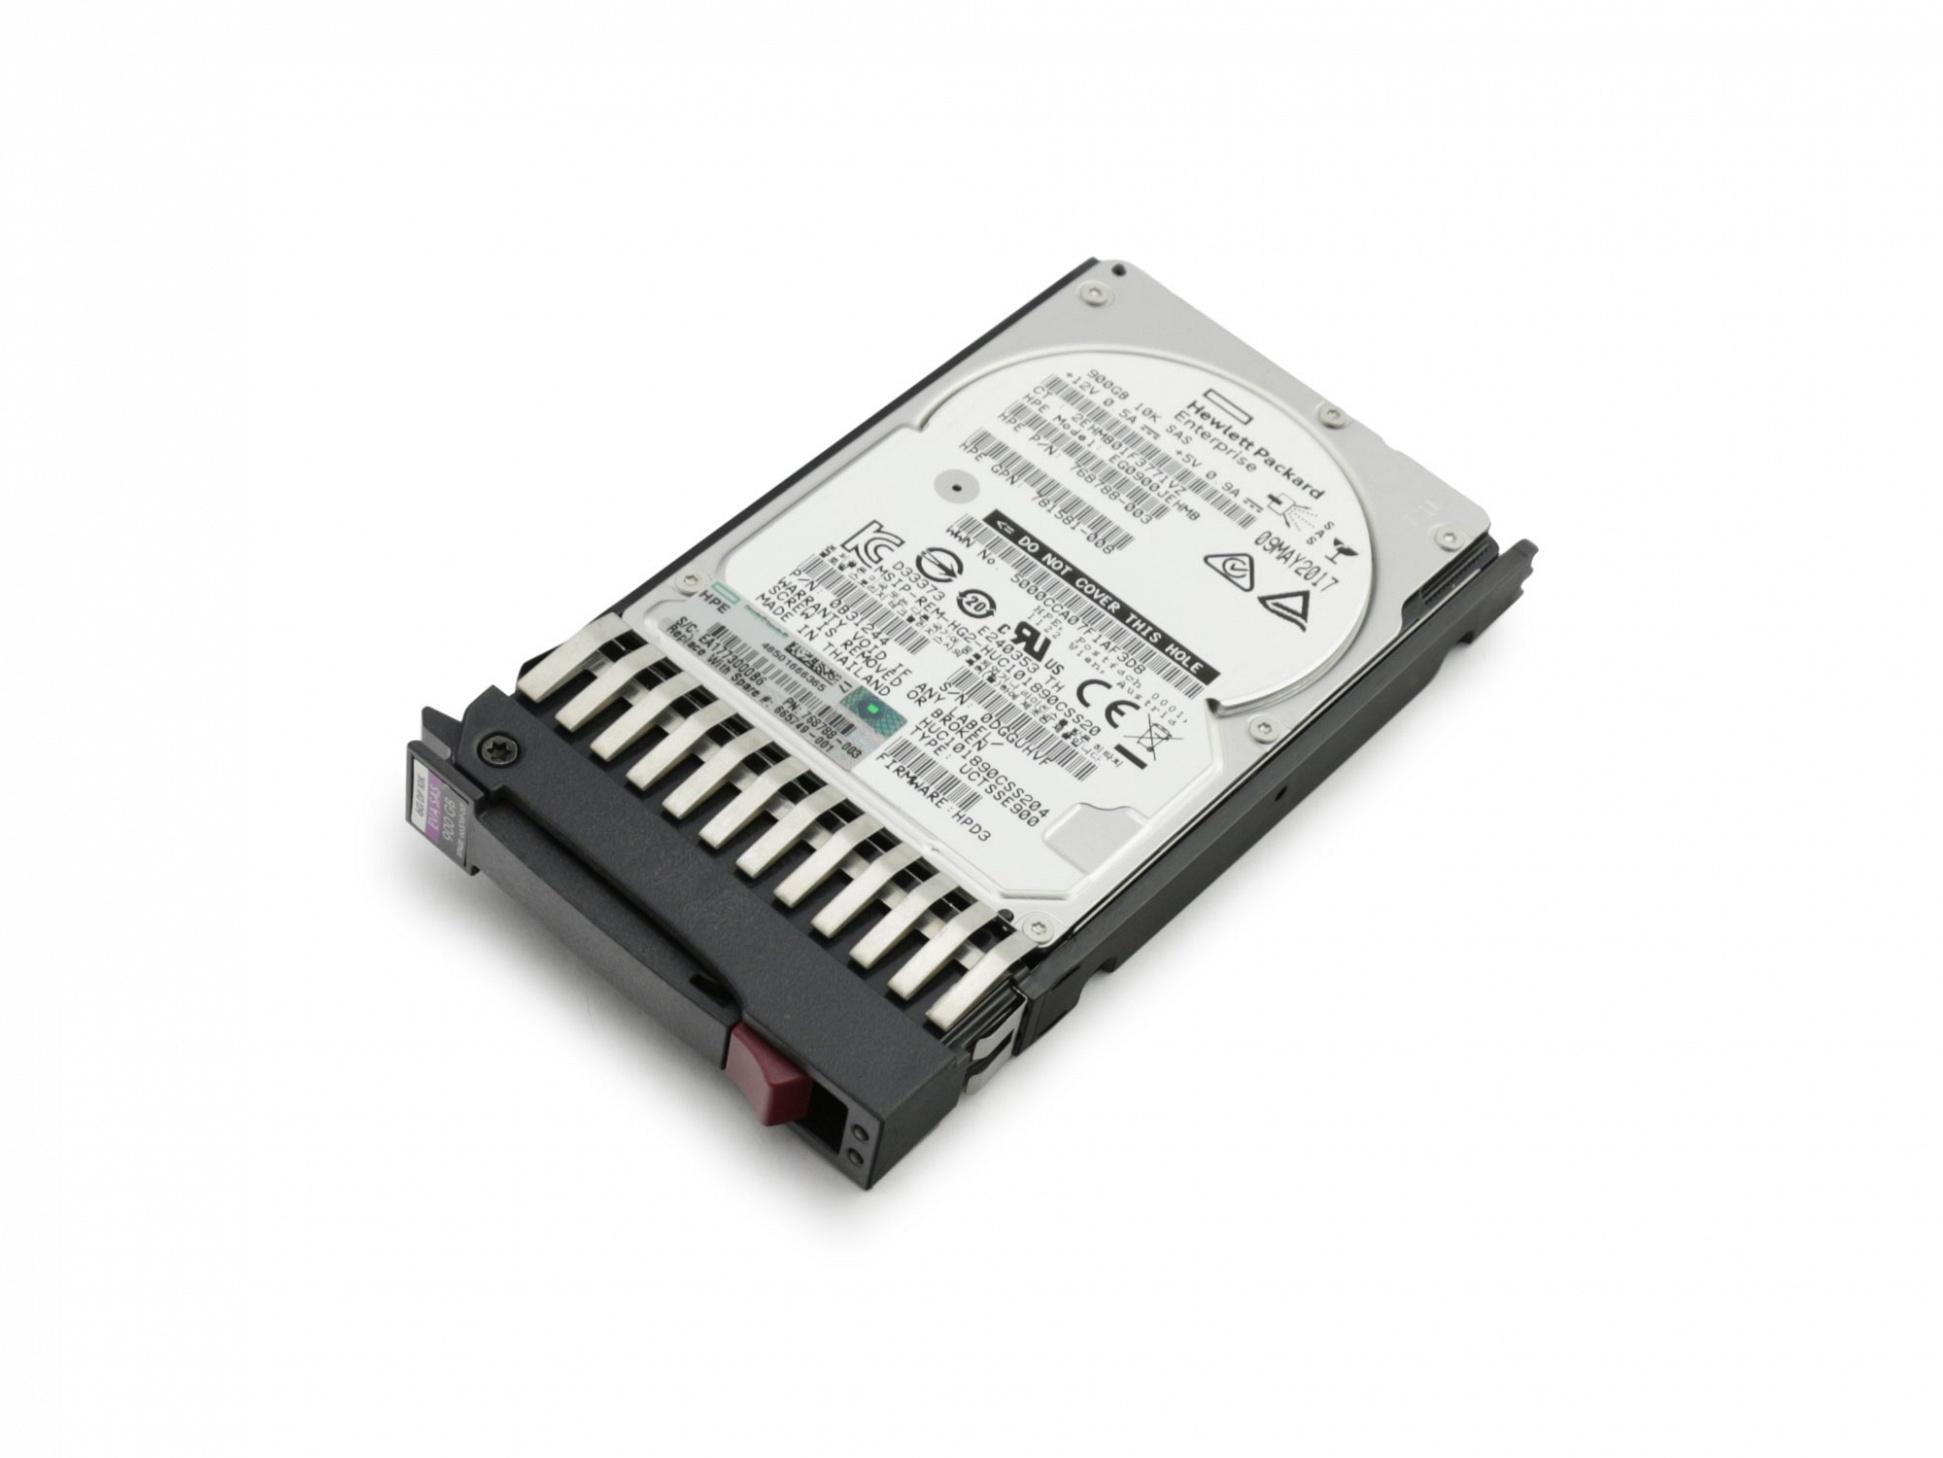 HP EVA P6300 Enclosure Server Festplatte HDD 900GB (2,5 Zoll / 6,4 cm) SAS II (6 Gb/s) 10K inkl. Hot-Plug